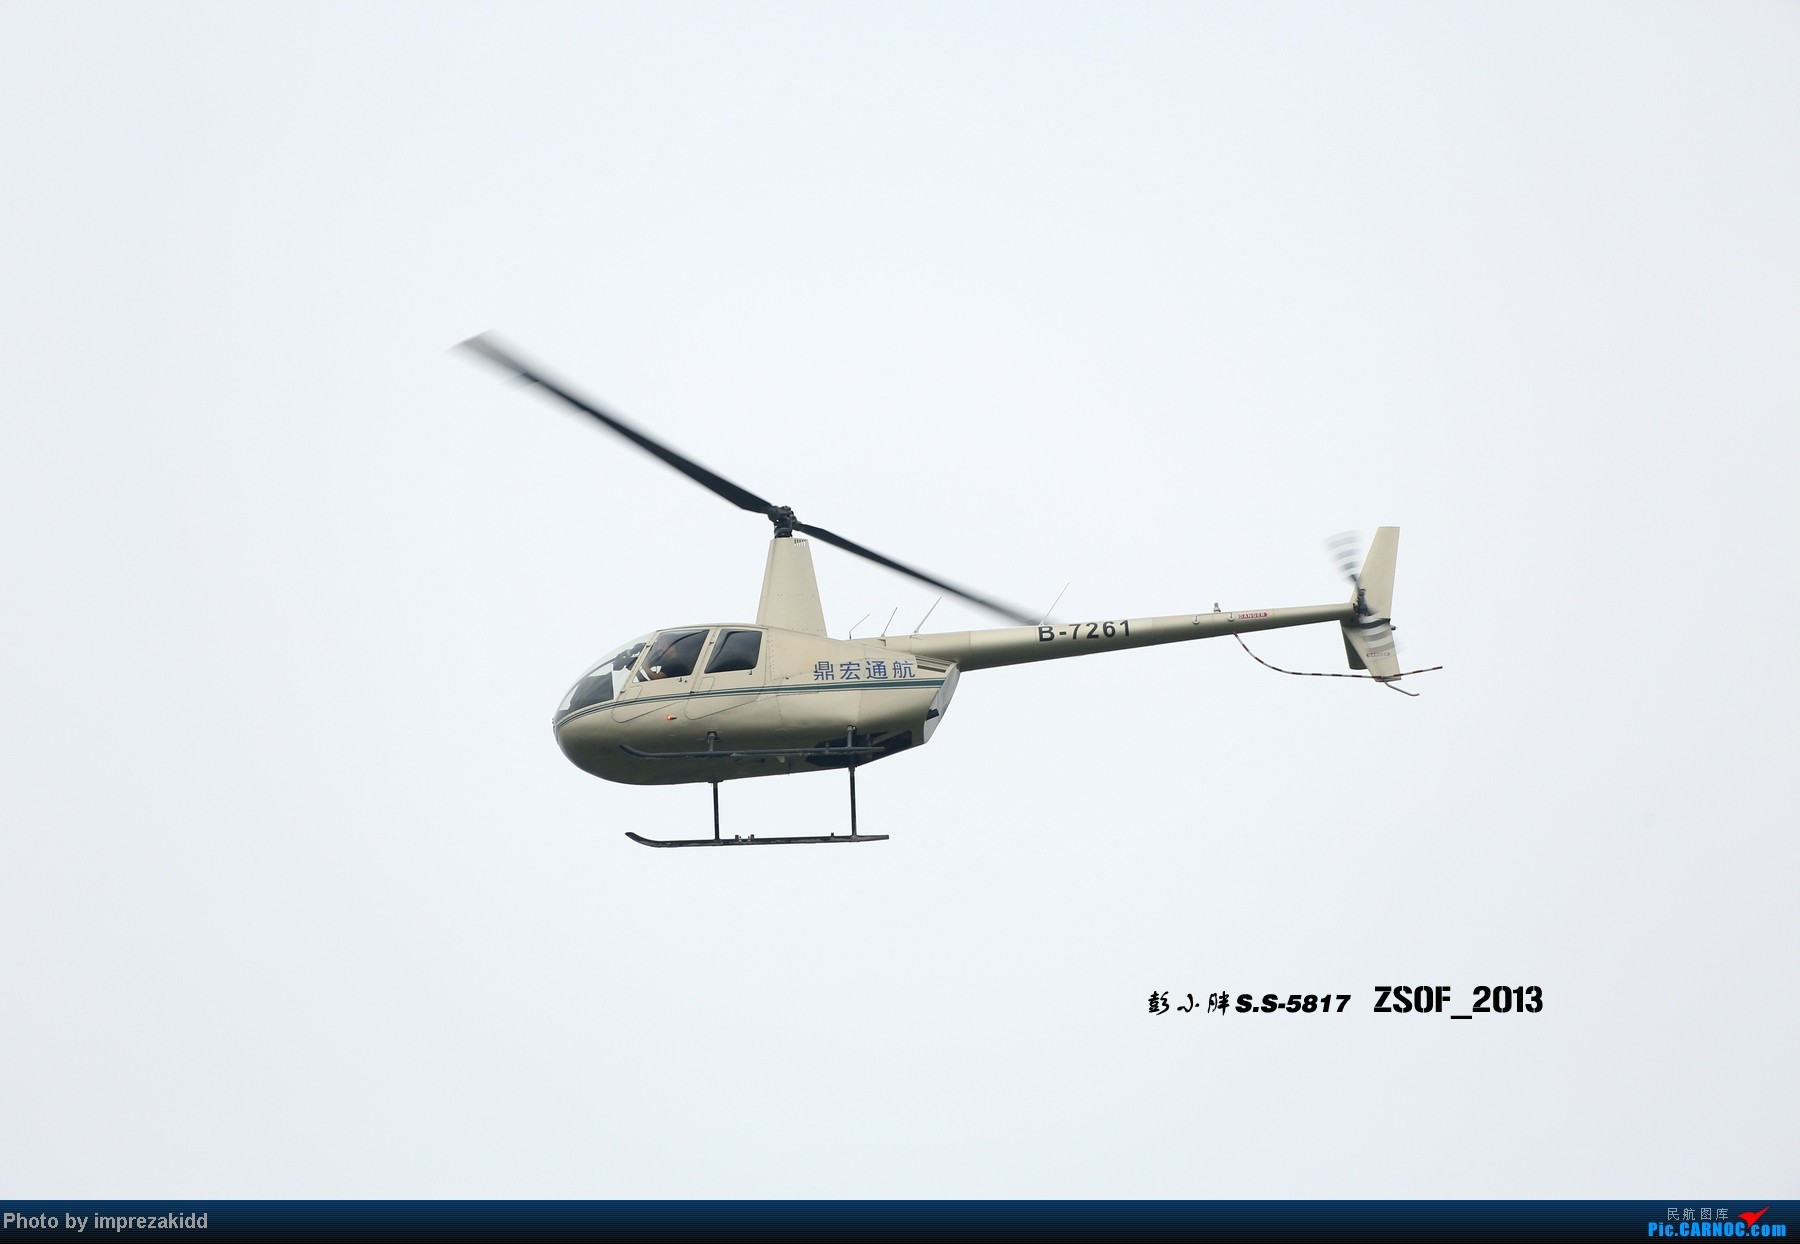 Re:[原创]【骆幕迎新】骆岗LastDay 纪念曾经属于我们的骆岗 ROBINSON R-44 B-7261 ZSOF 小二楼